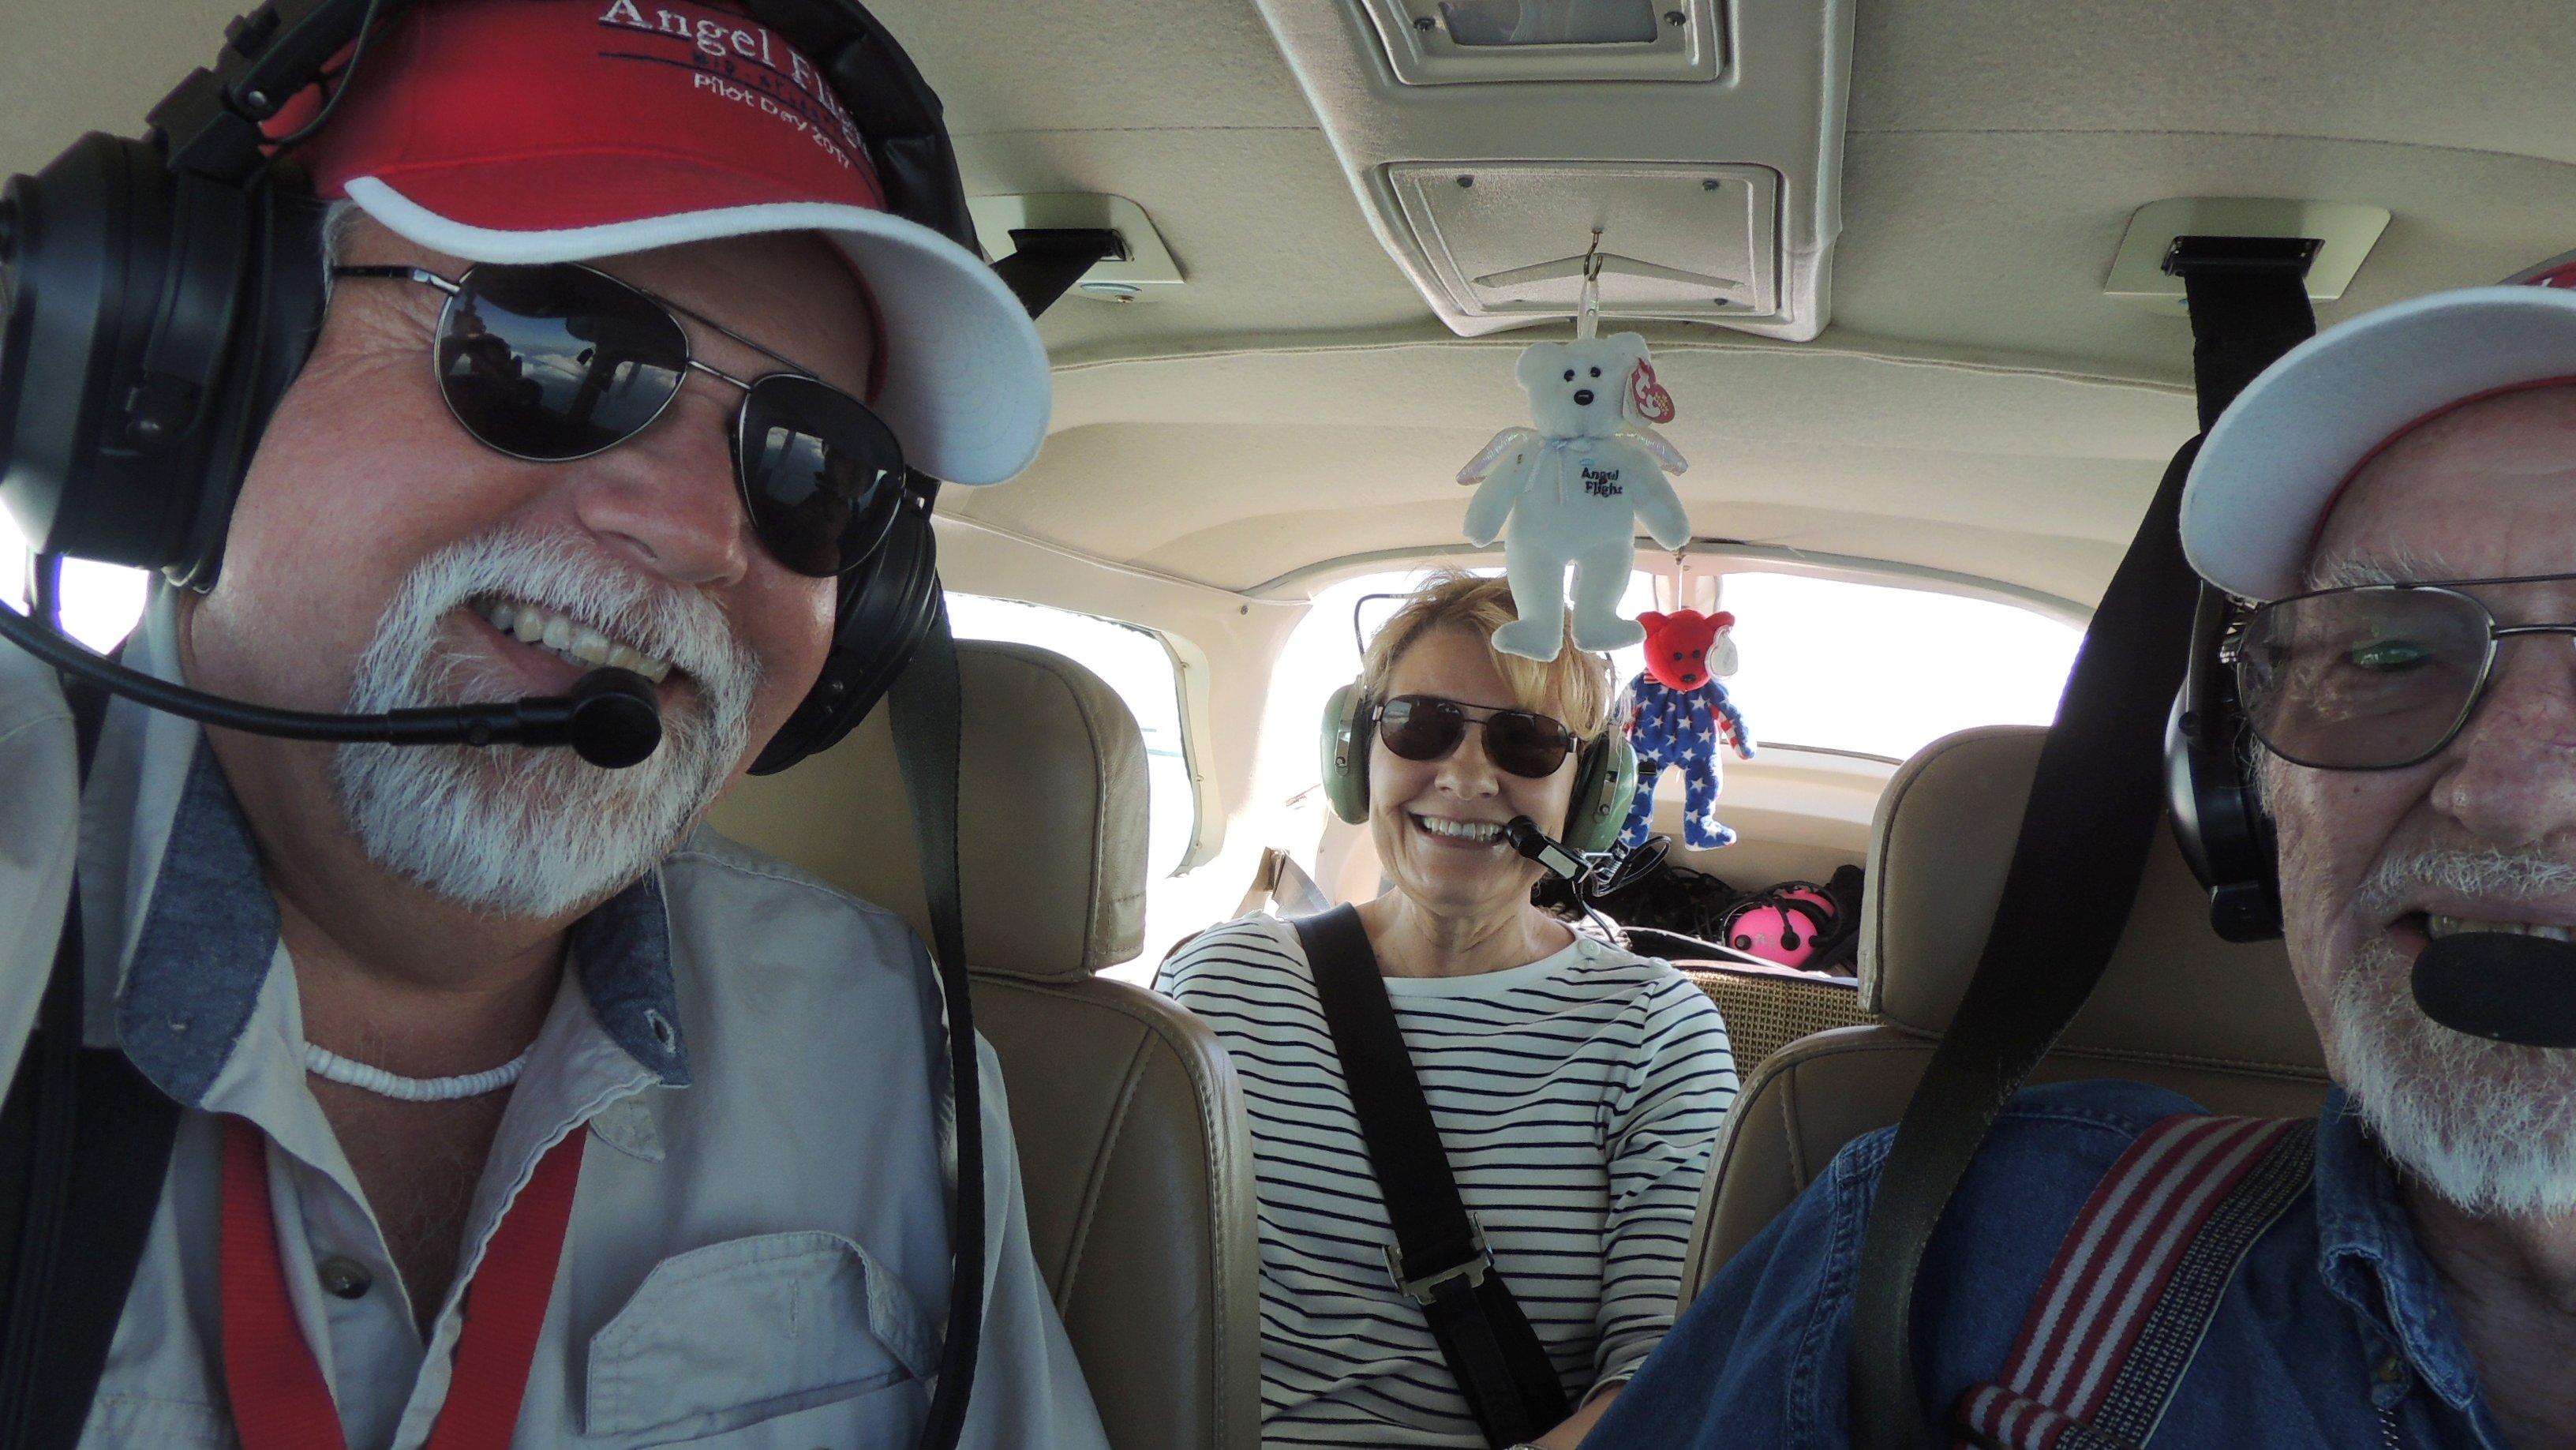 With Pam heading to Roanoke VA